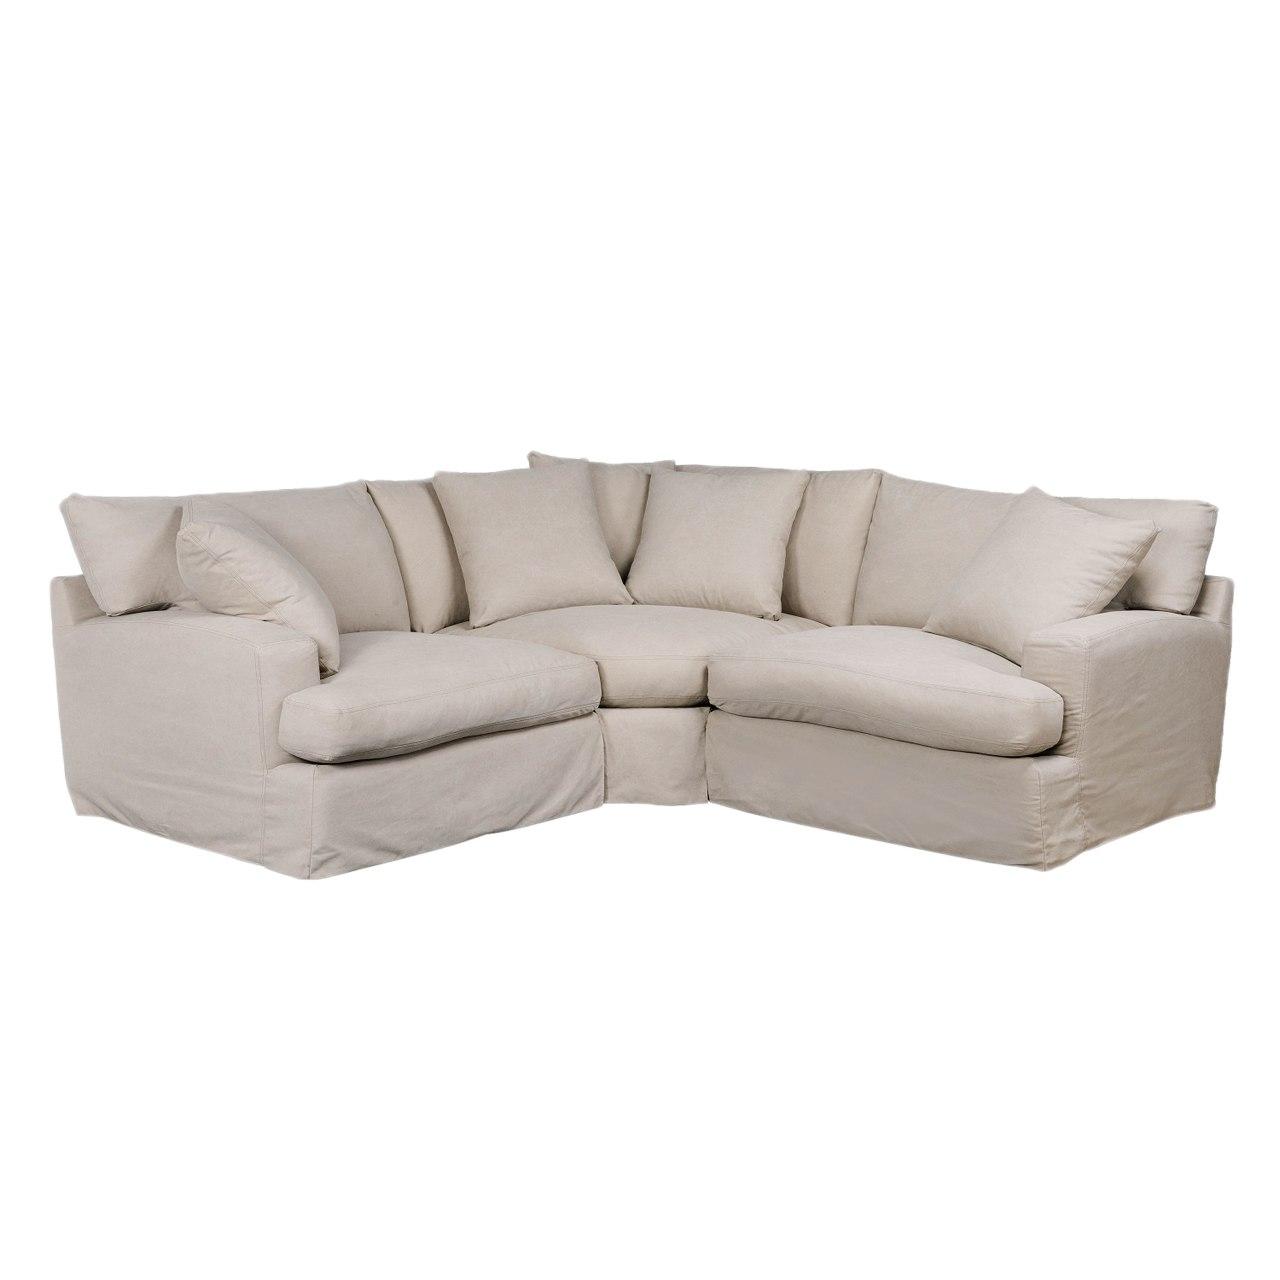 3 piece sectional sofa elisa 3-piece sectional sofa UHFSKHK